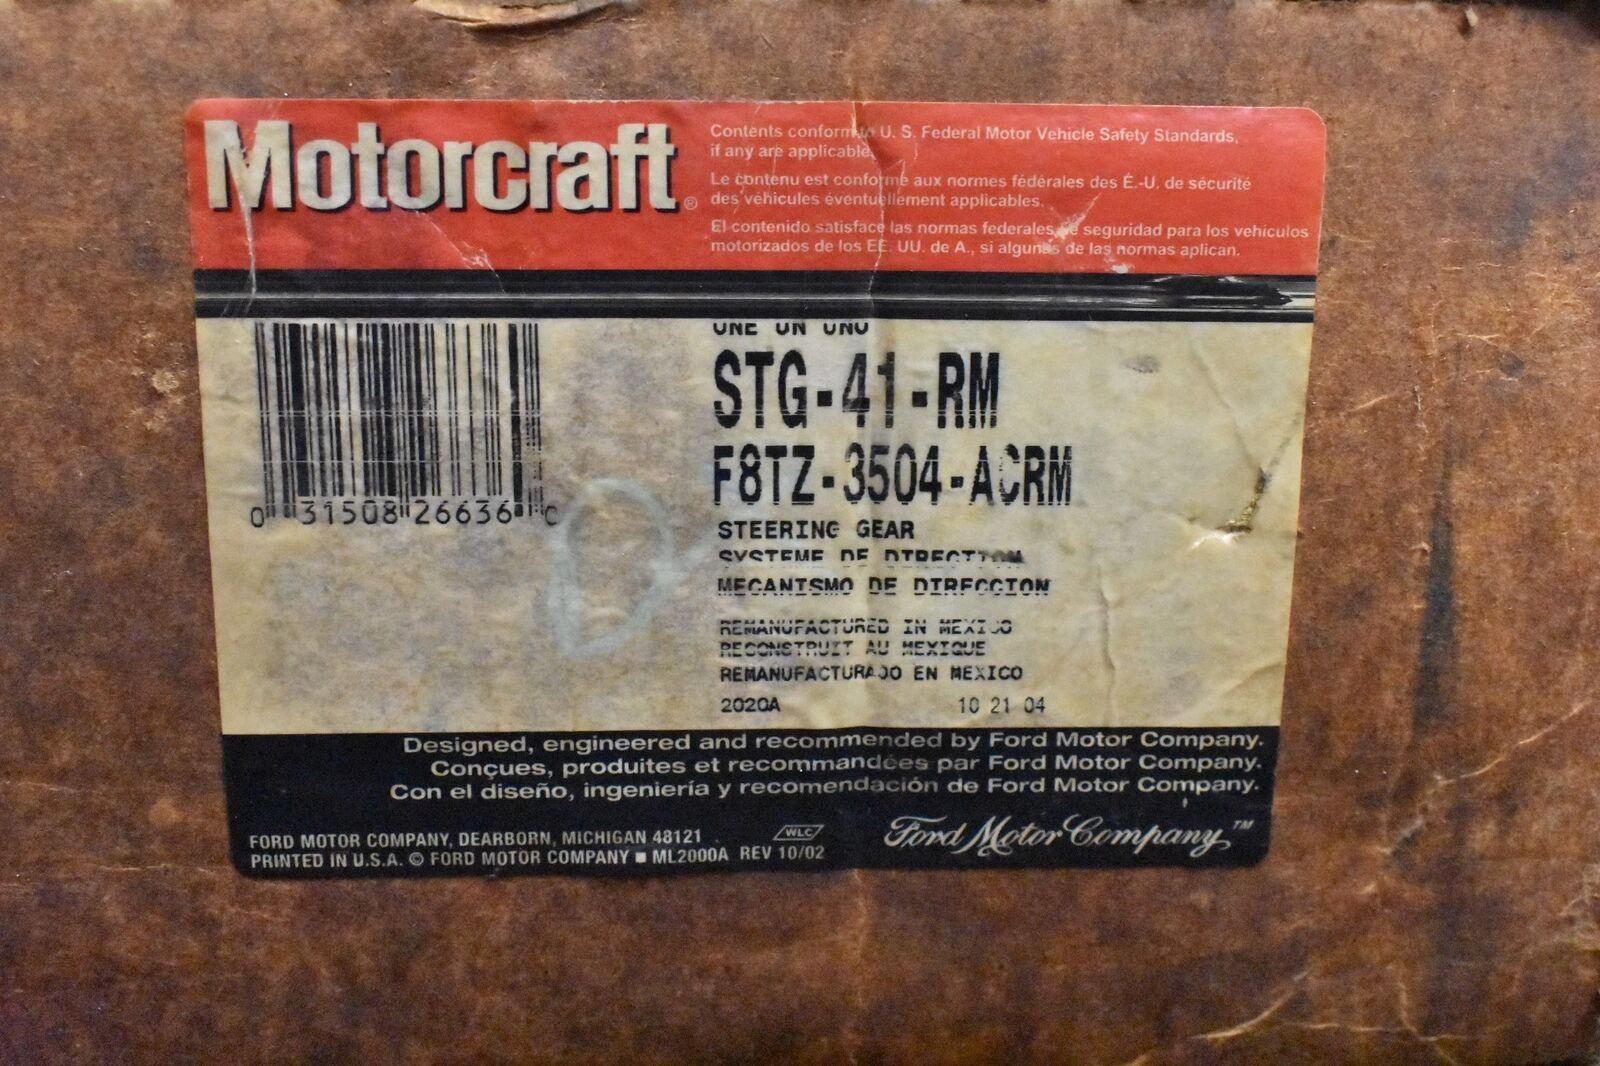 Motorcraft STG41RM Remanufactured Steering Gear